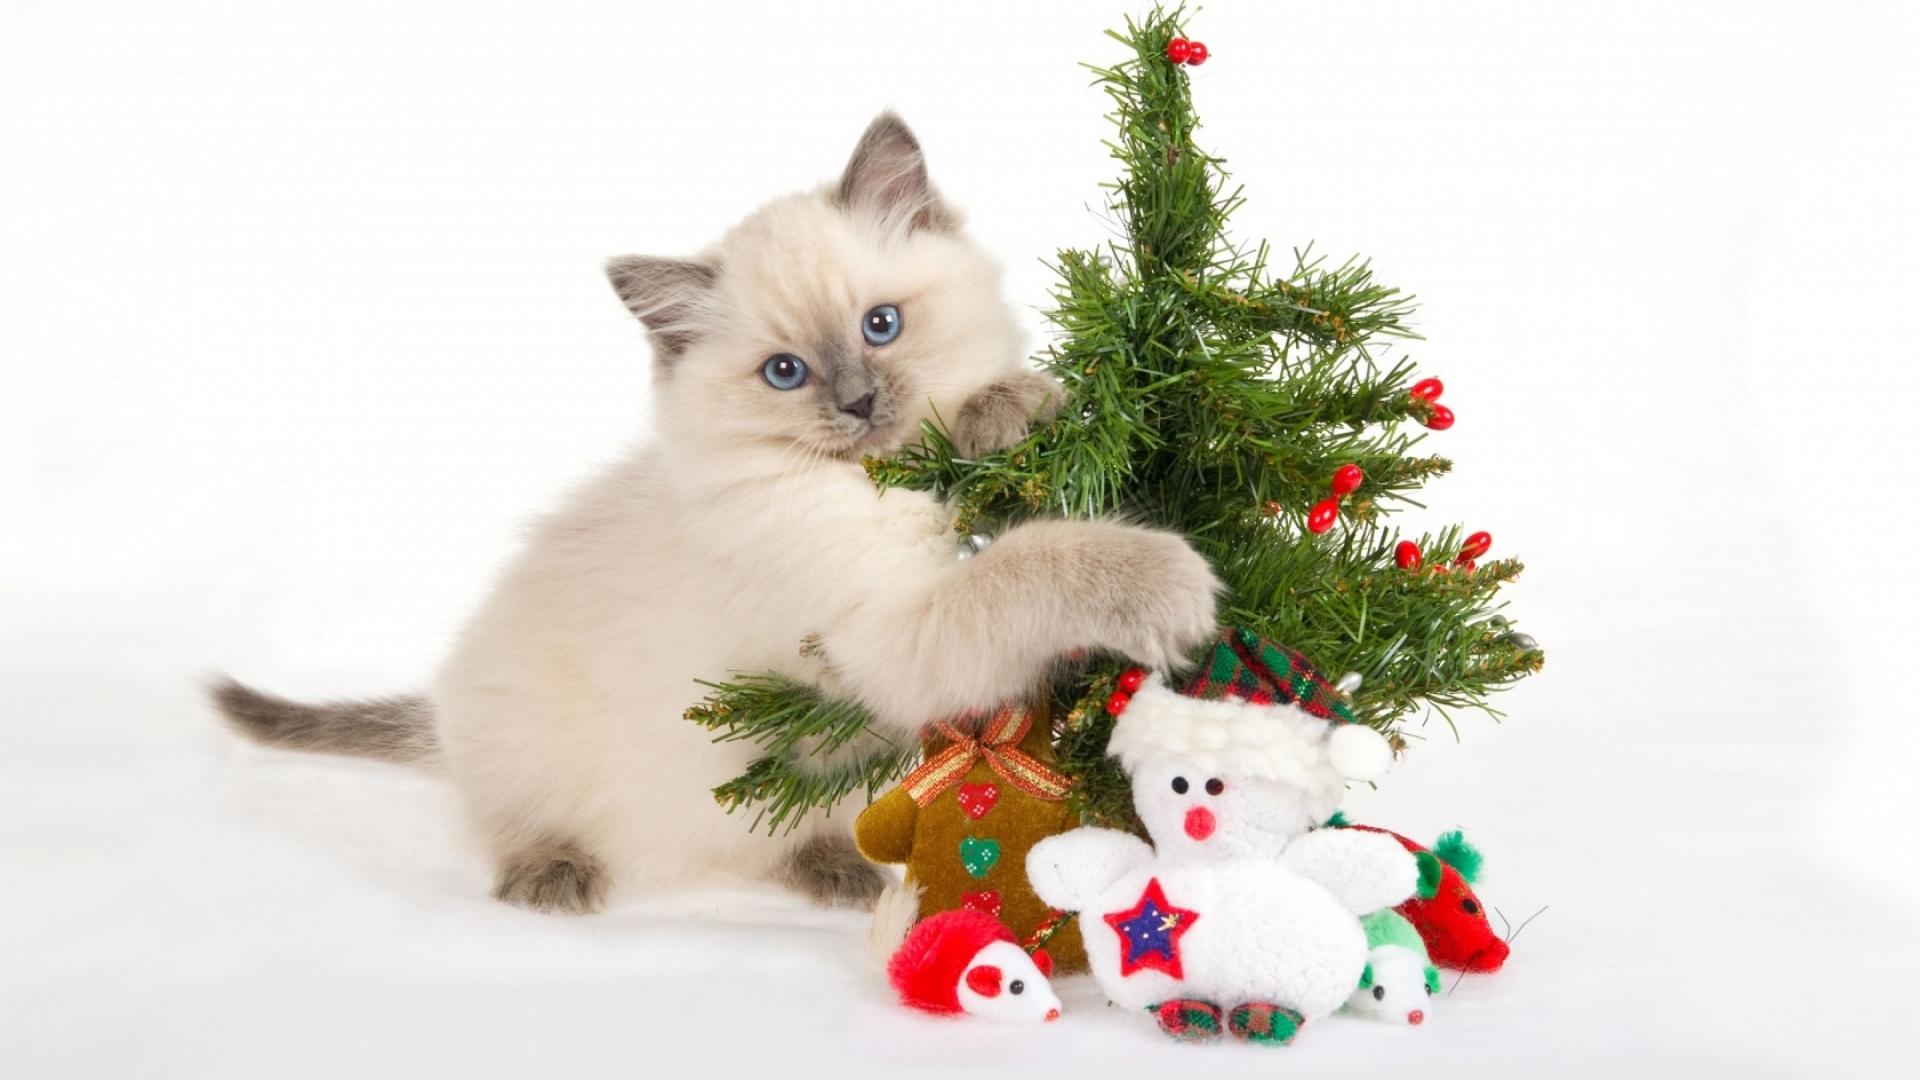 Christmas Hd Wallpaper Background Image 1920x1080 Id 95887